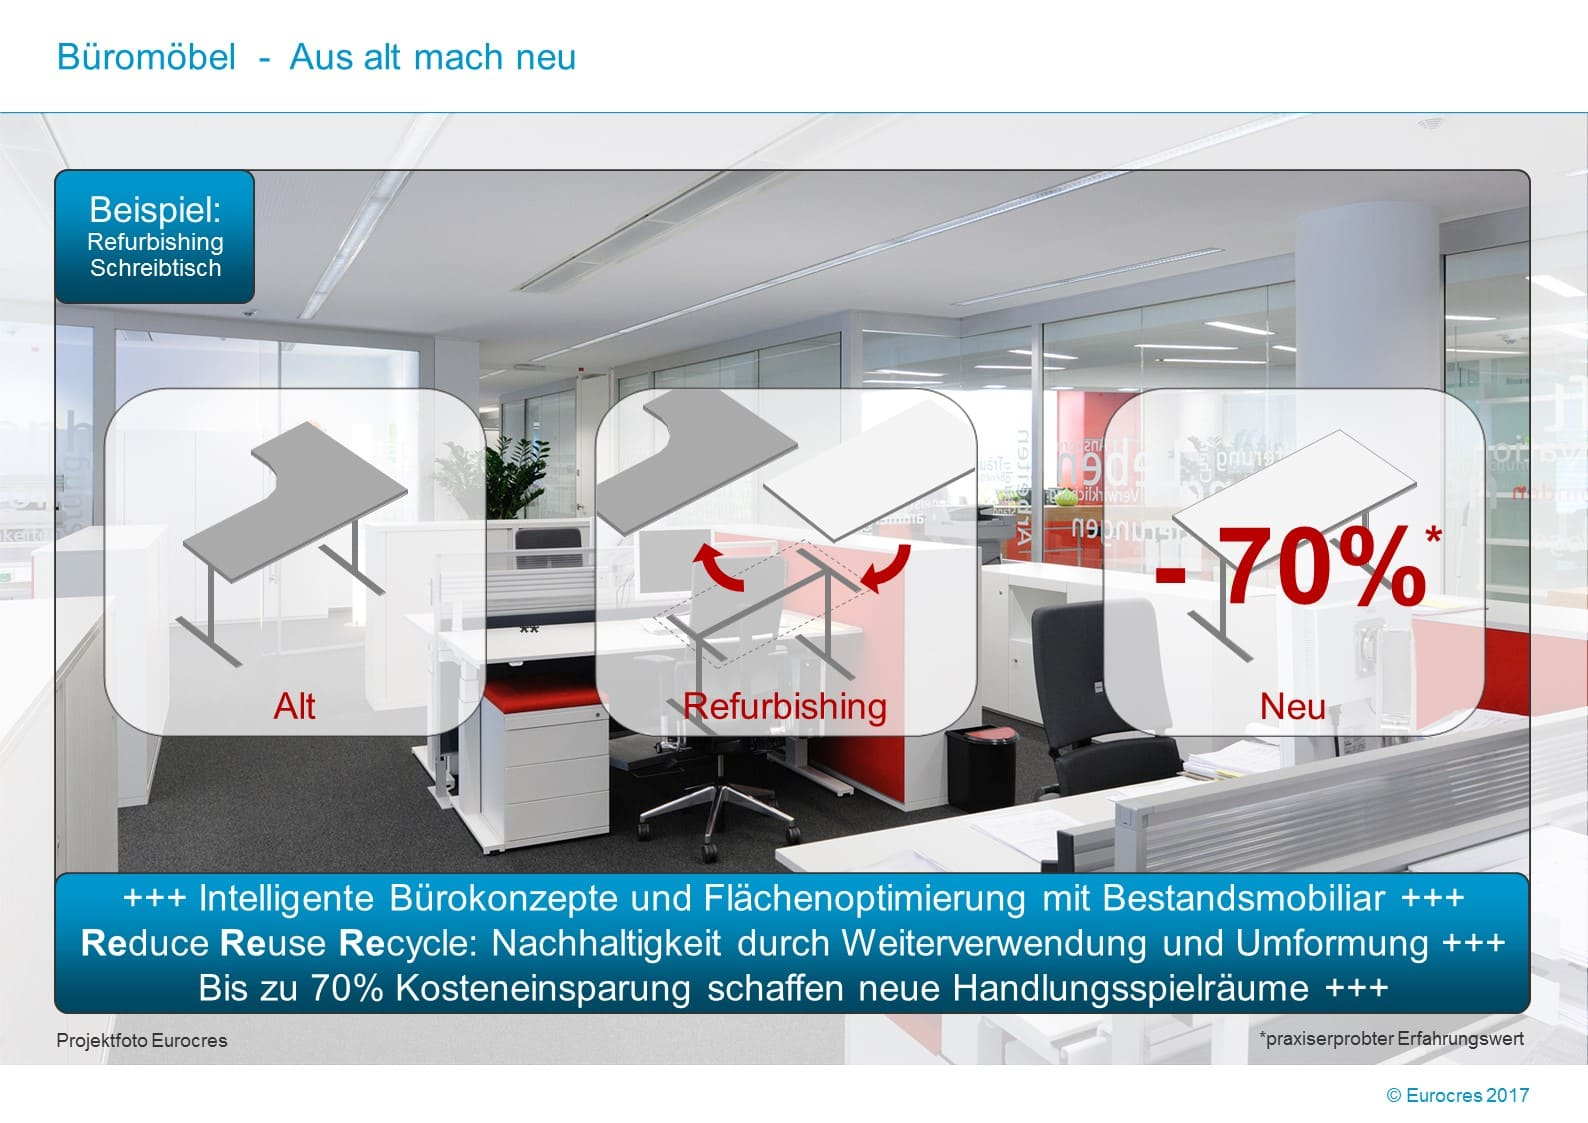 WorkPlace Flash: Büromöbel – Aus alt mach neu